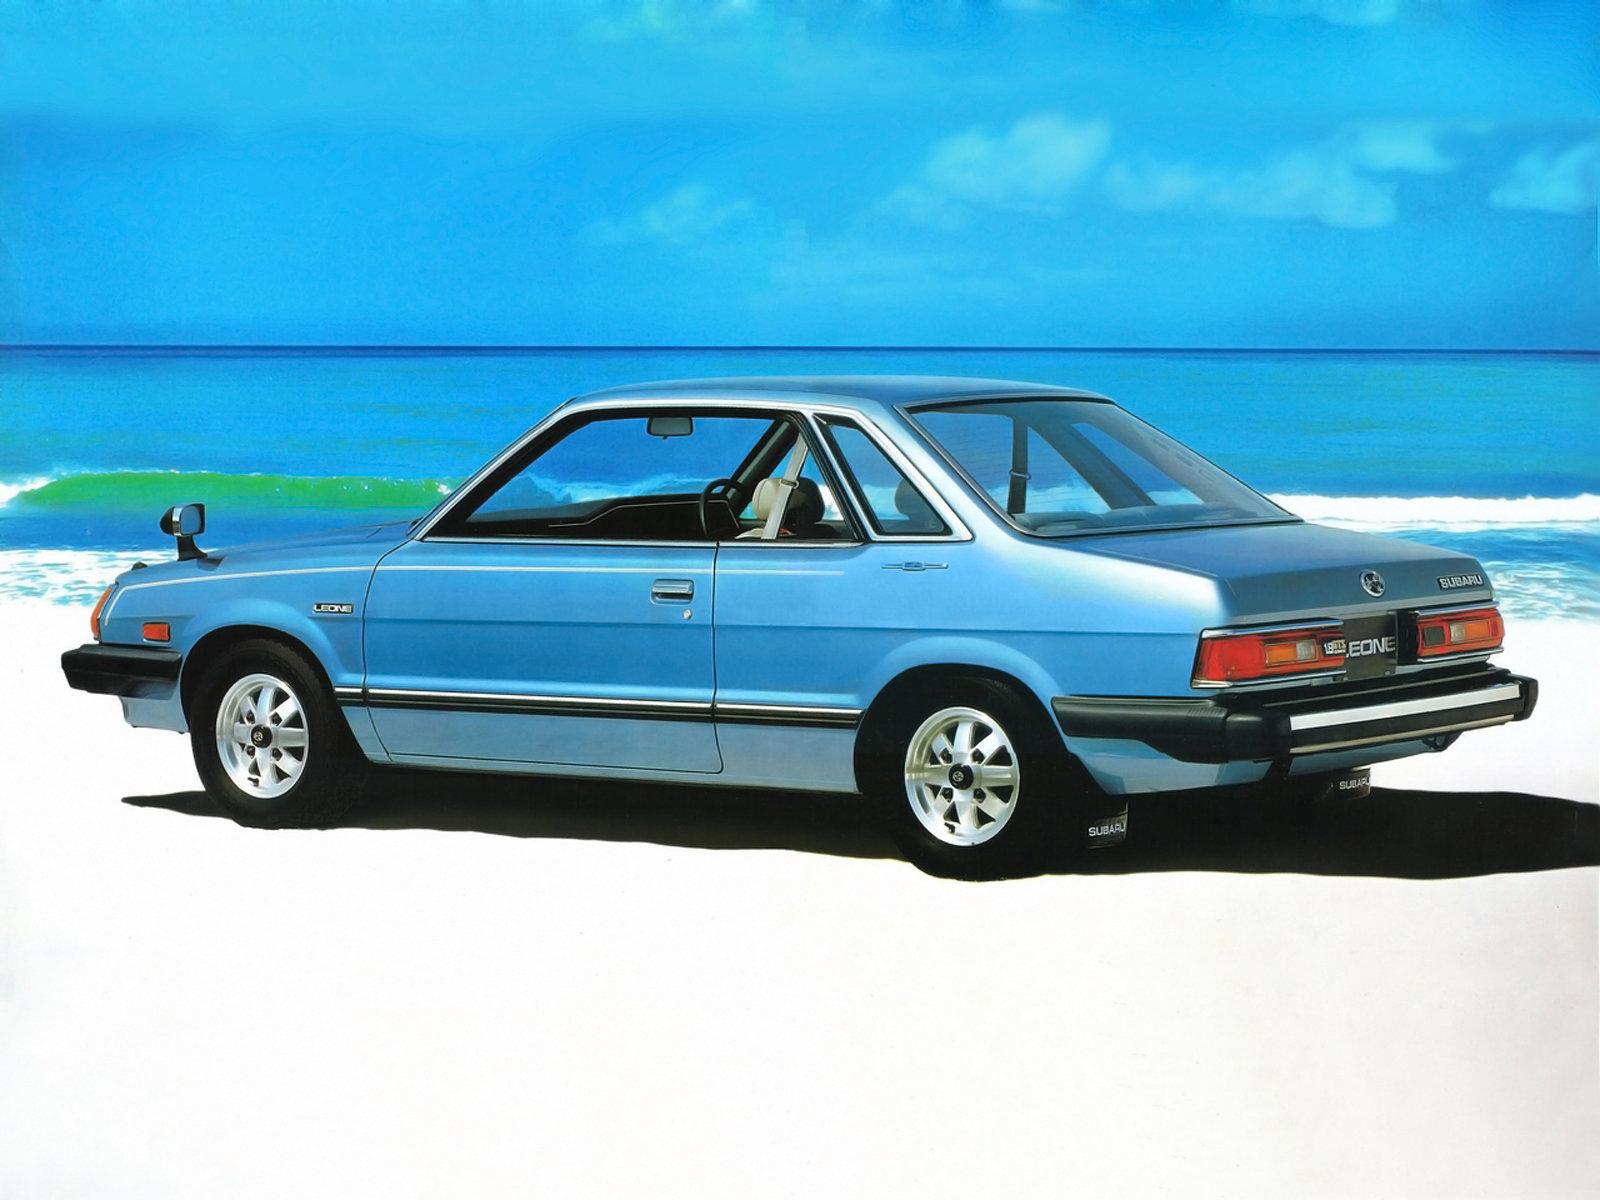 Subaru_Leone_Coupe_1979.jpg